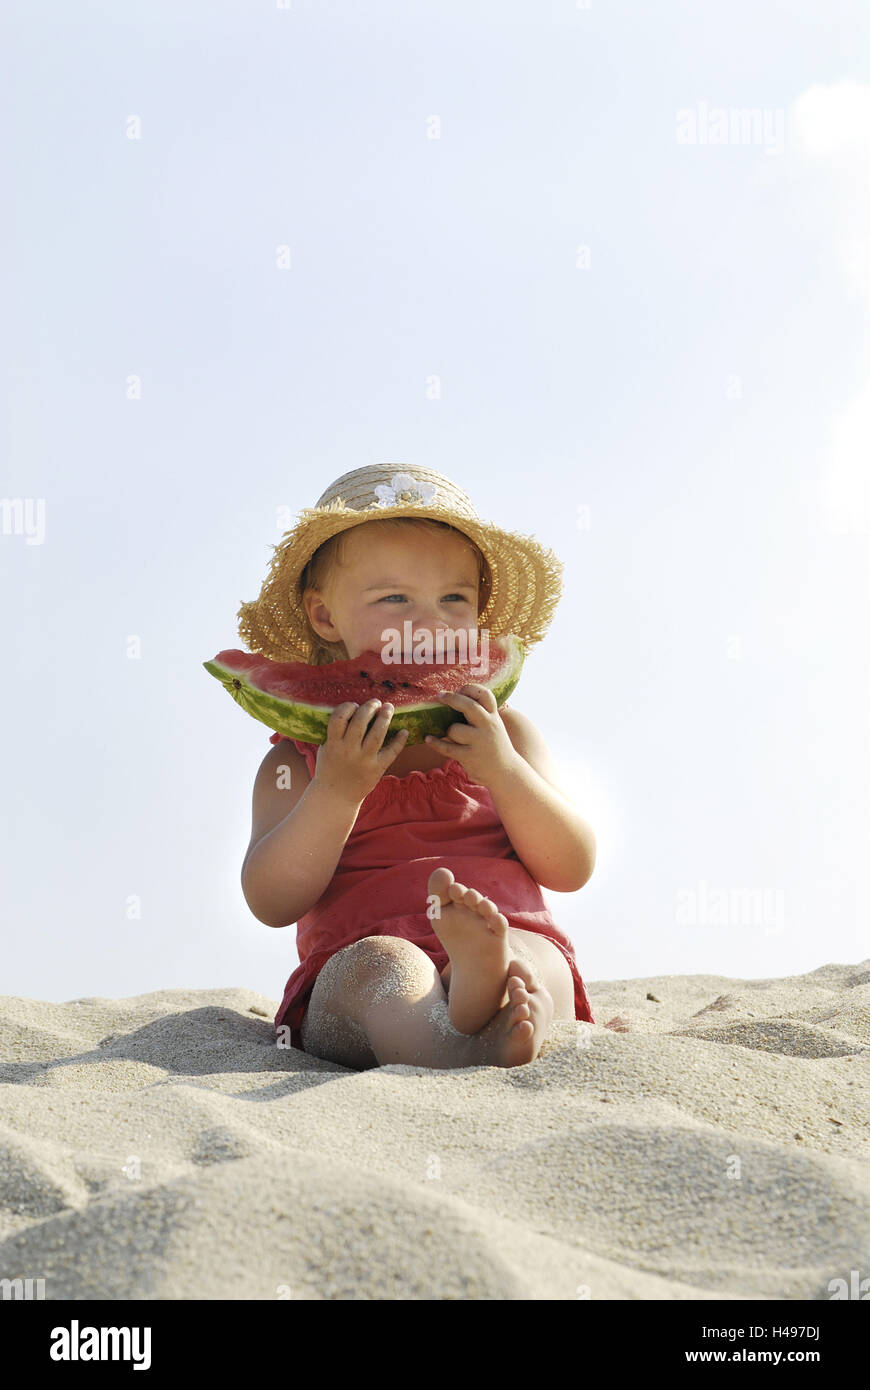 Girls, beach, sit, eat melon, - Stock Image